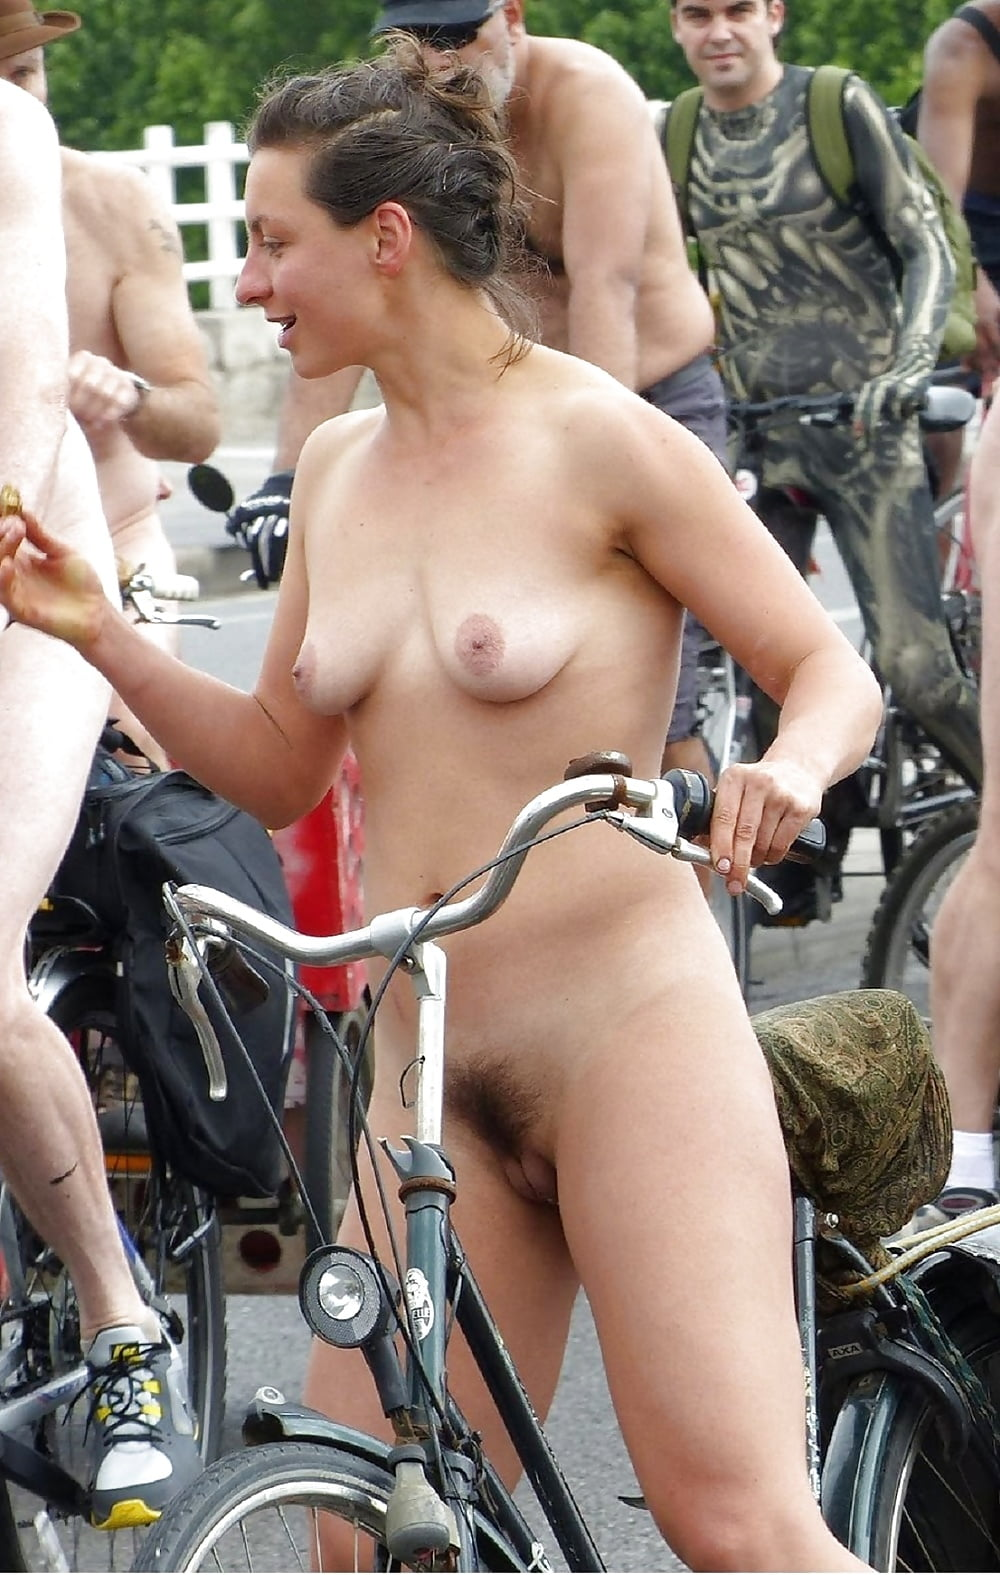 dog-andgirl-naked-biker-twats-sex